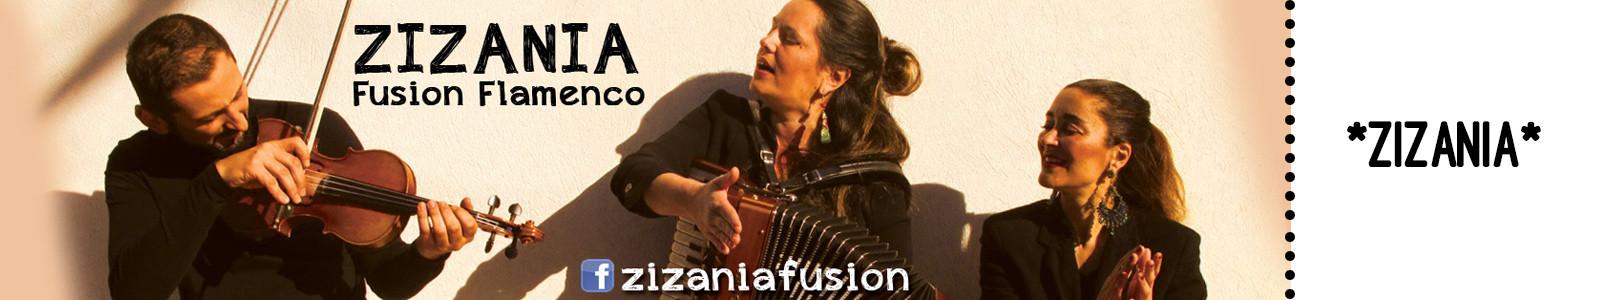 Zizania – Fusion Flamenco